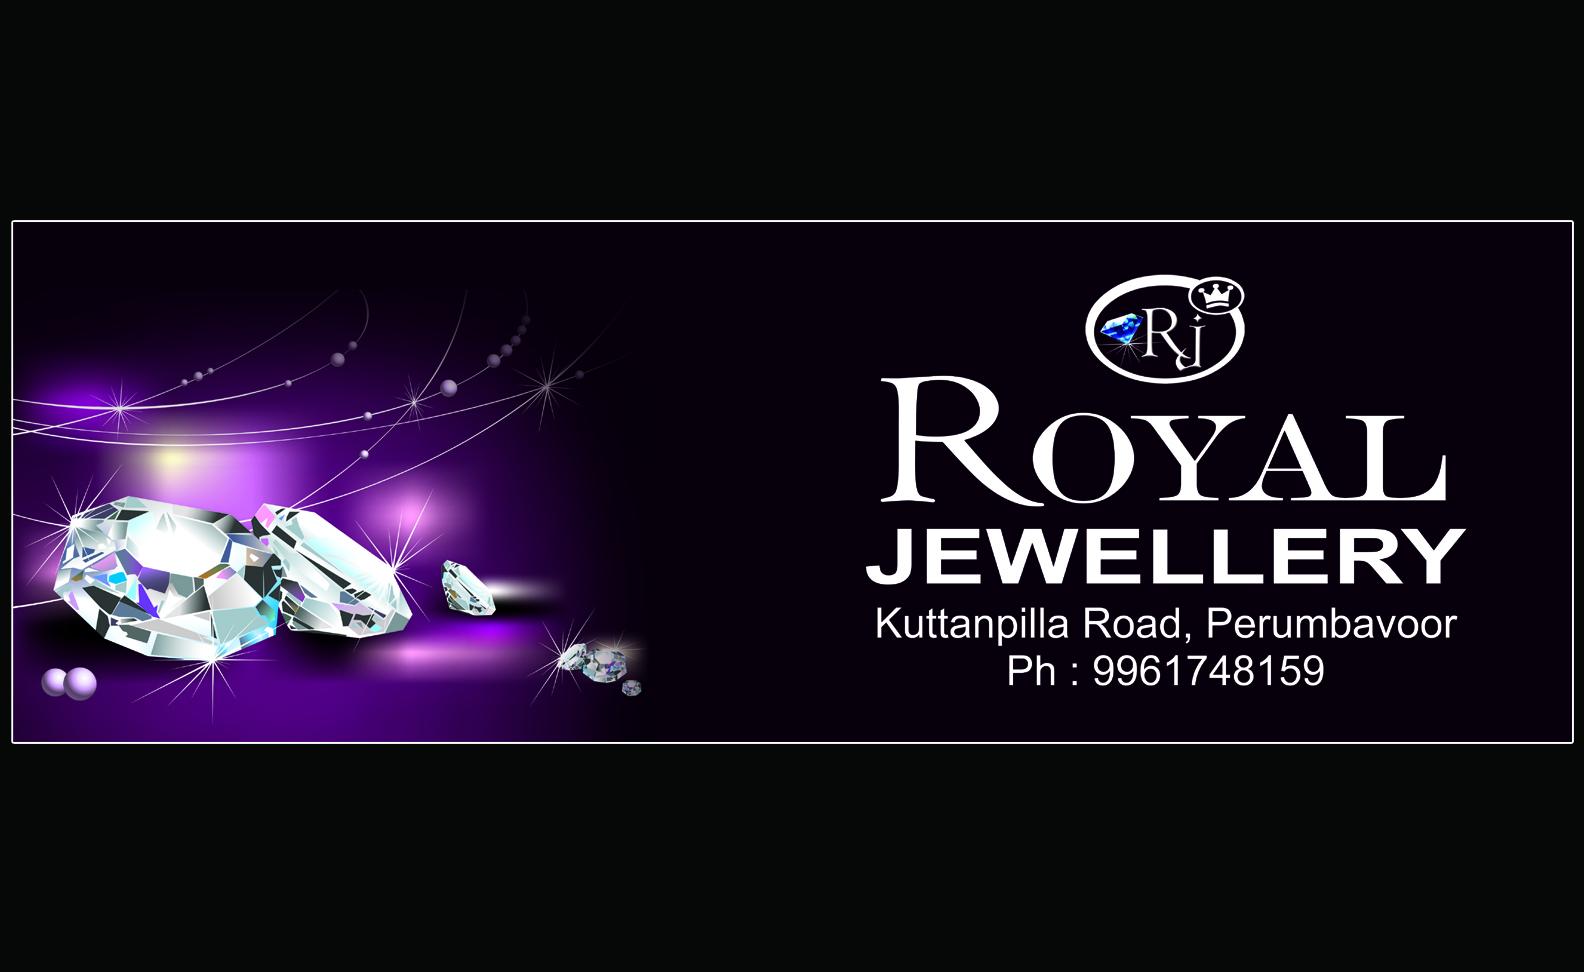 Banner design for jewellery - Royal Jewellery Perumbavoor 6x2 Banner